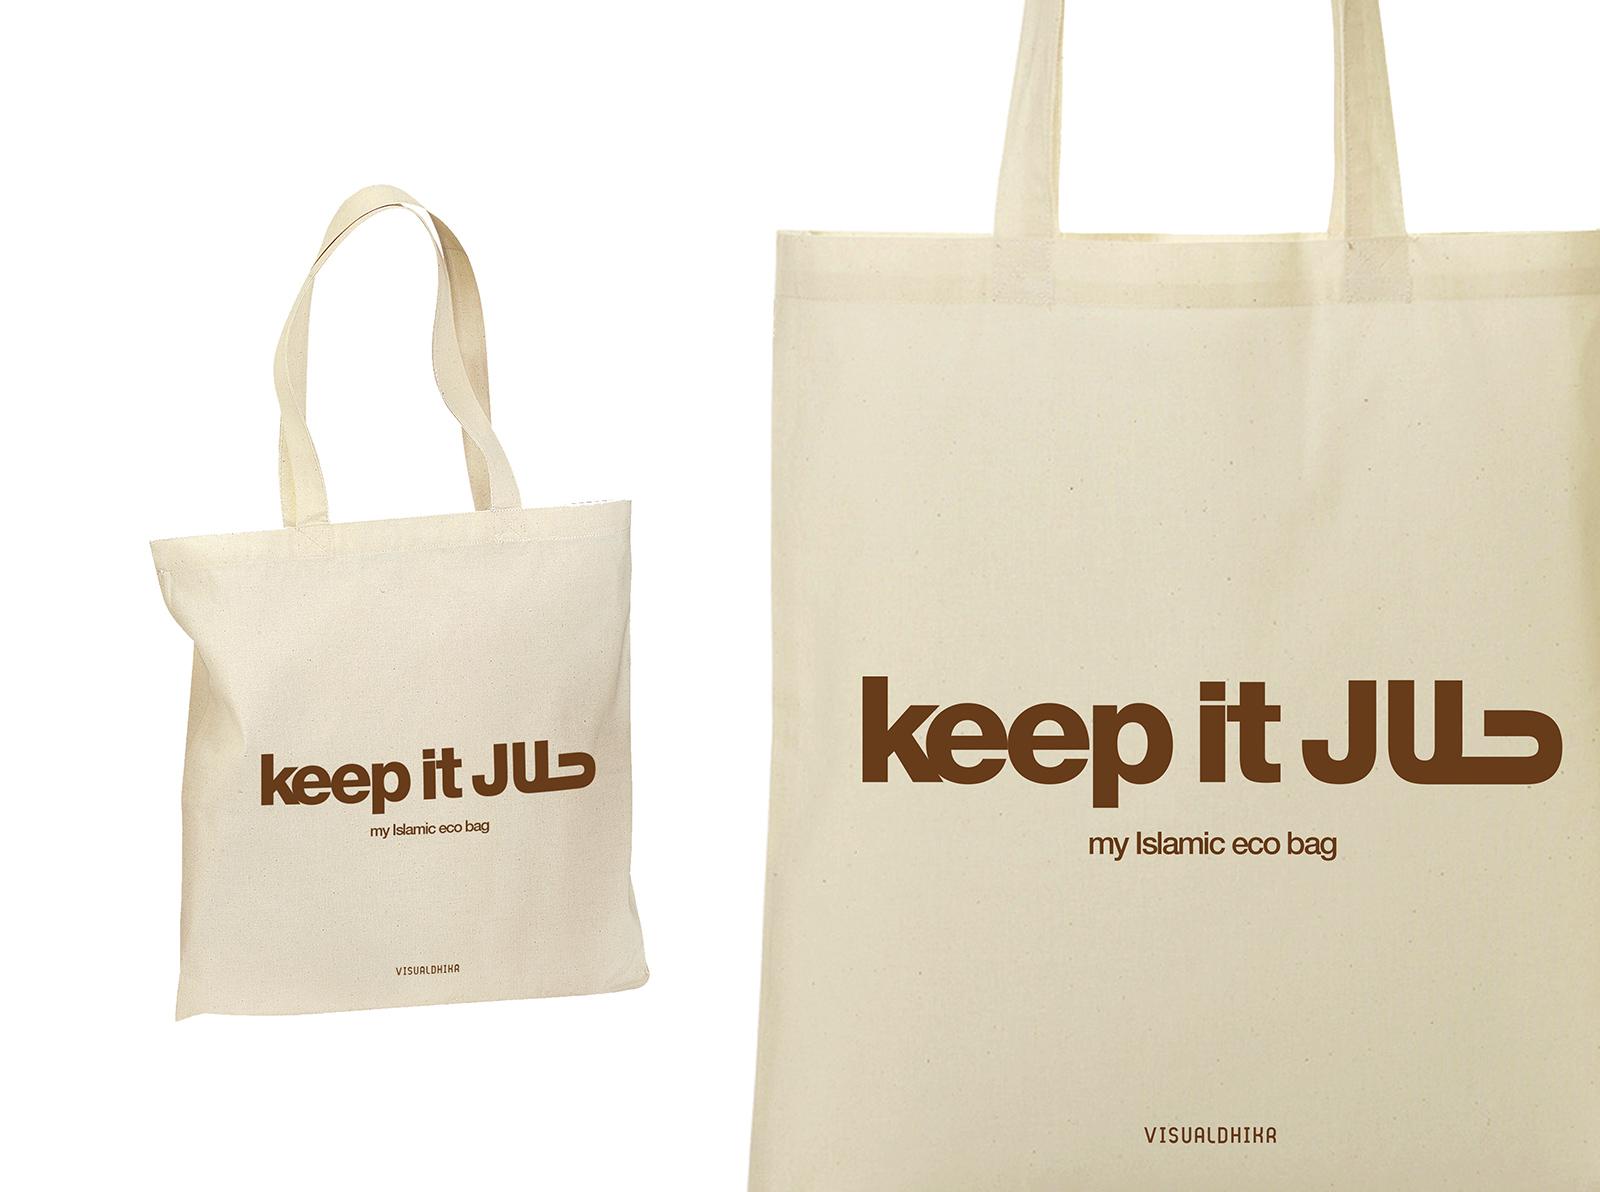 vd-eco-bag-KIH-natural-web